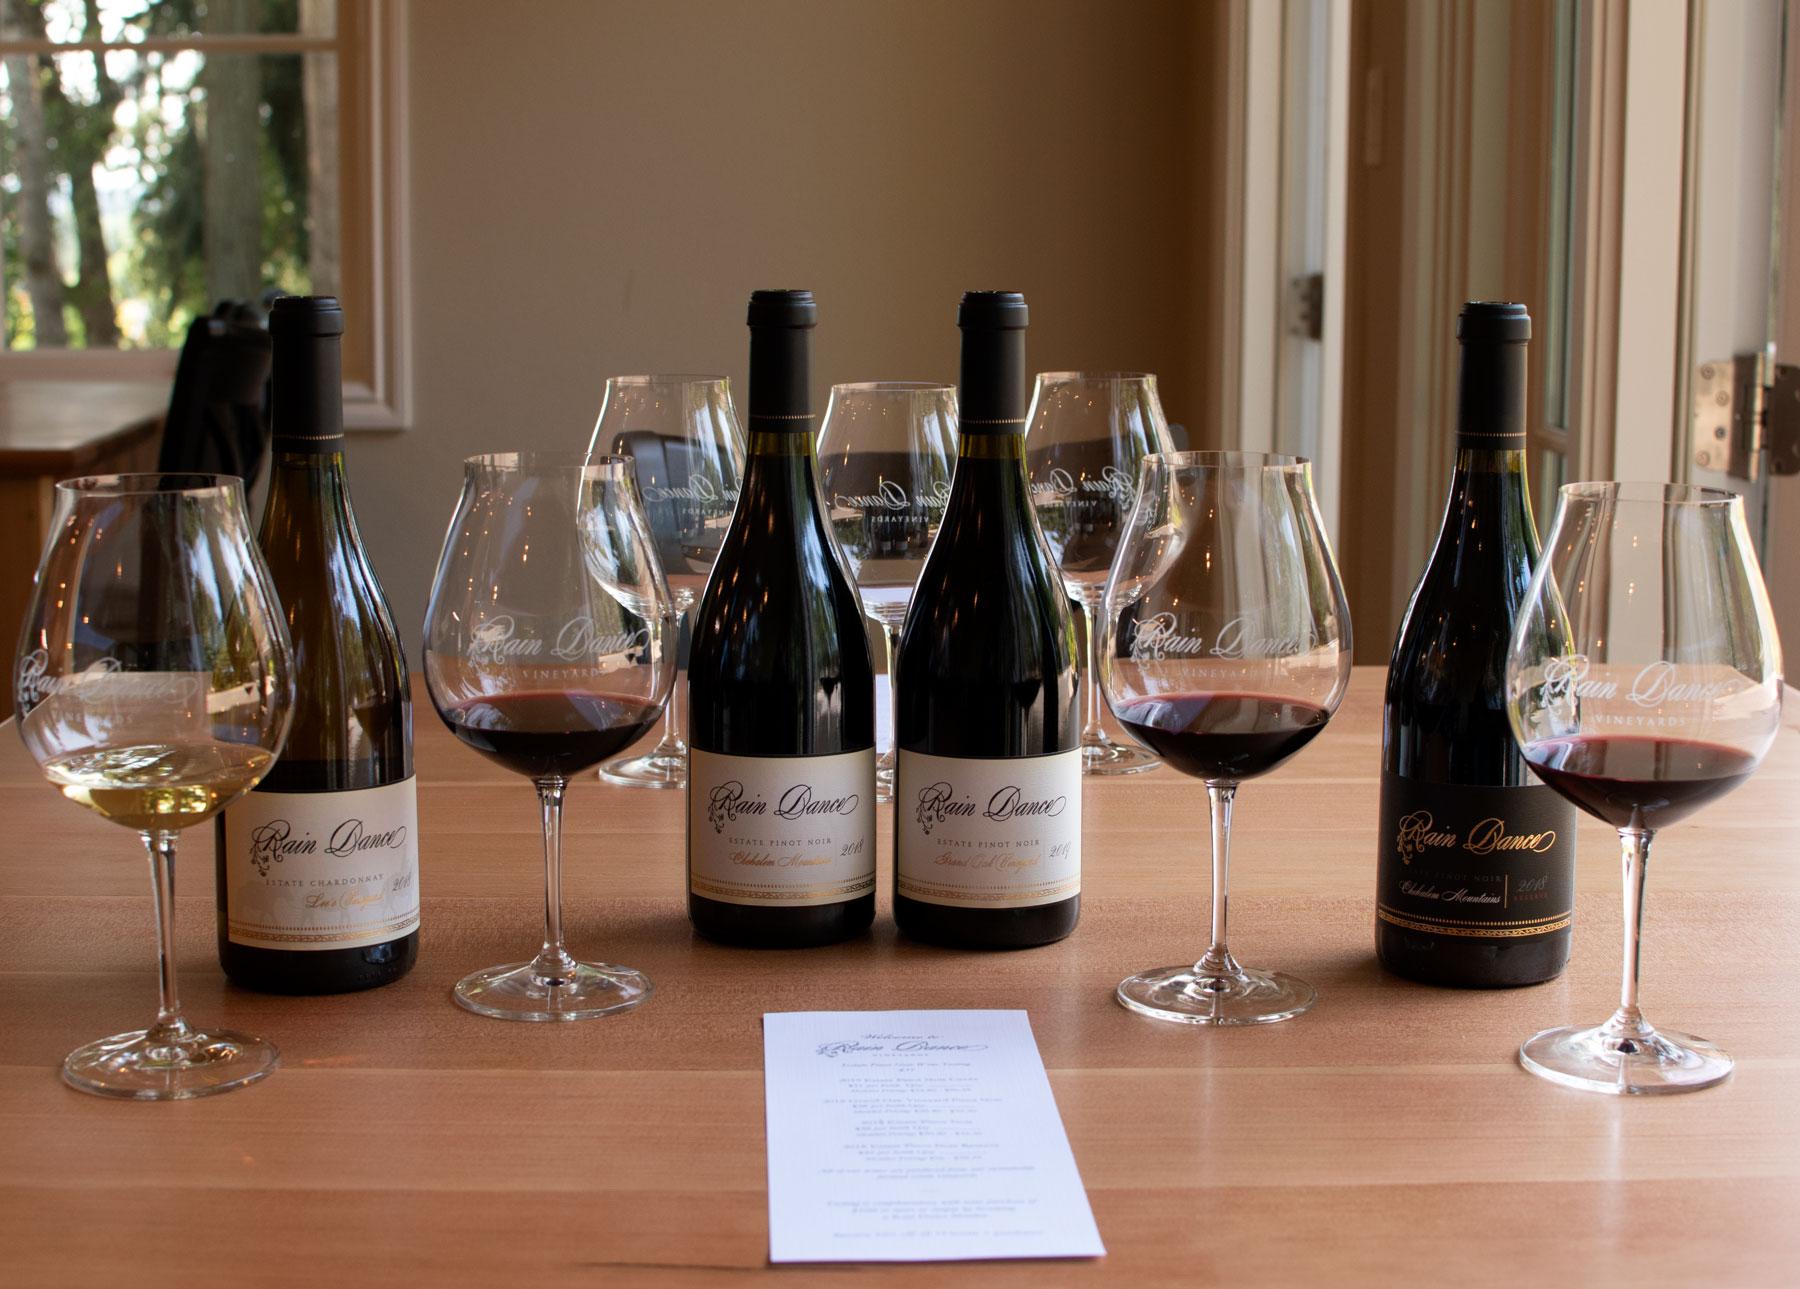 Enjoy a full flight of wines at Rain Dance Vineyards